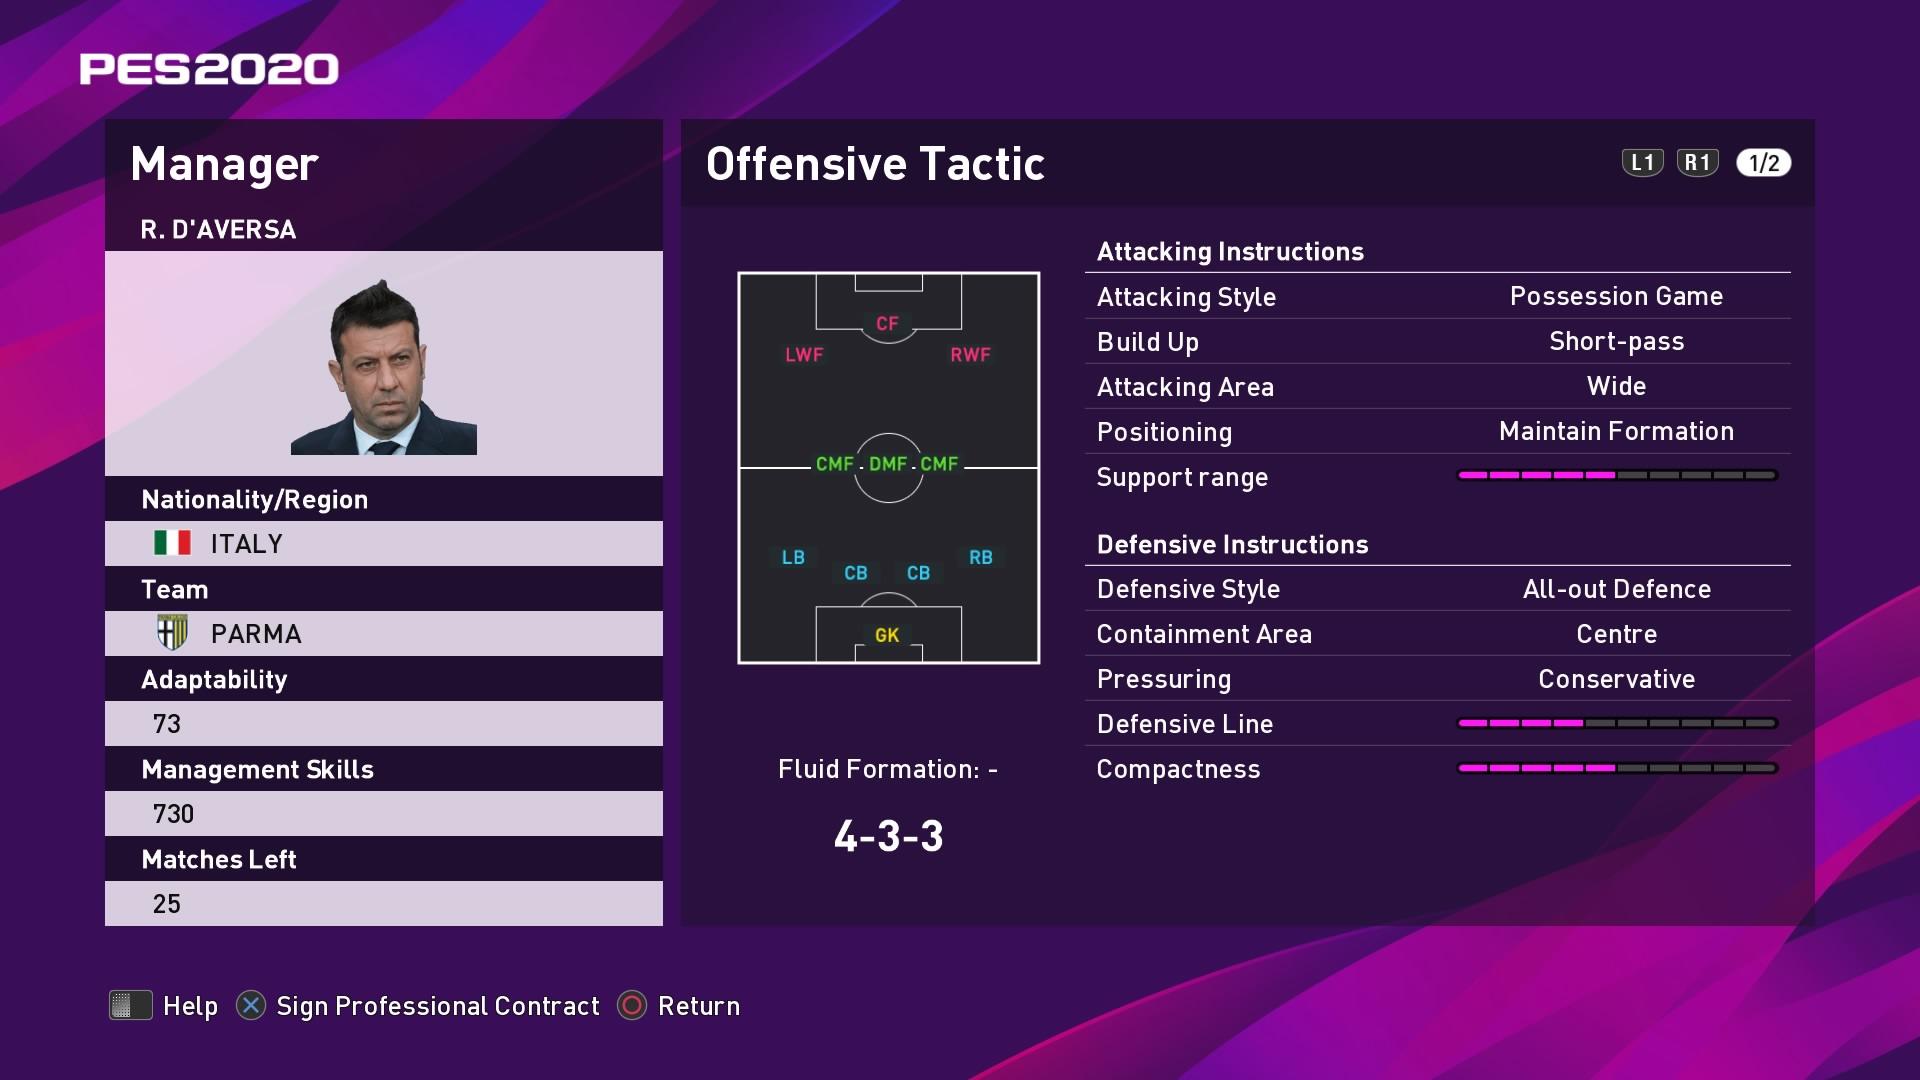 R. D'Aversa (Roberto D'Aversa) Offensive Tactic in PES 2020 myClub